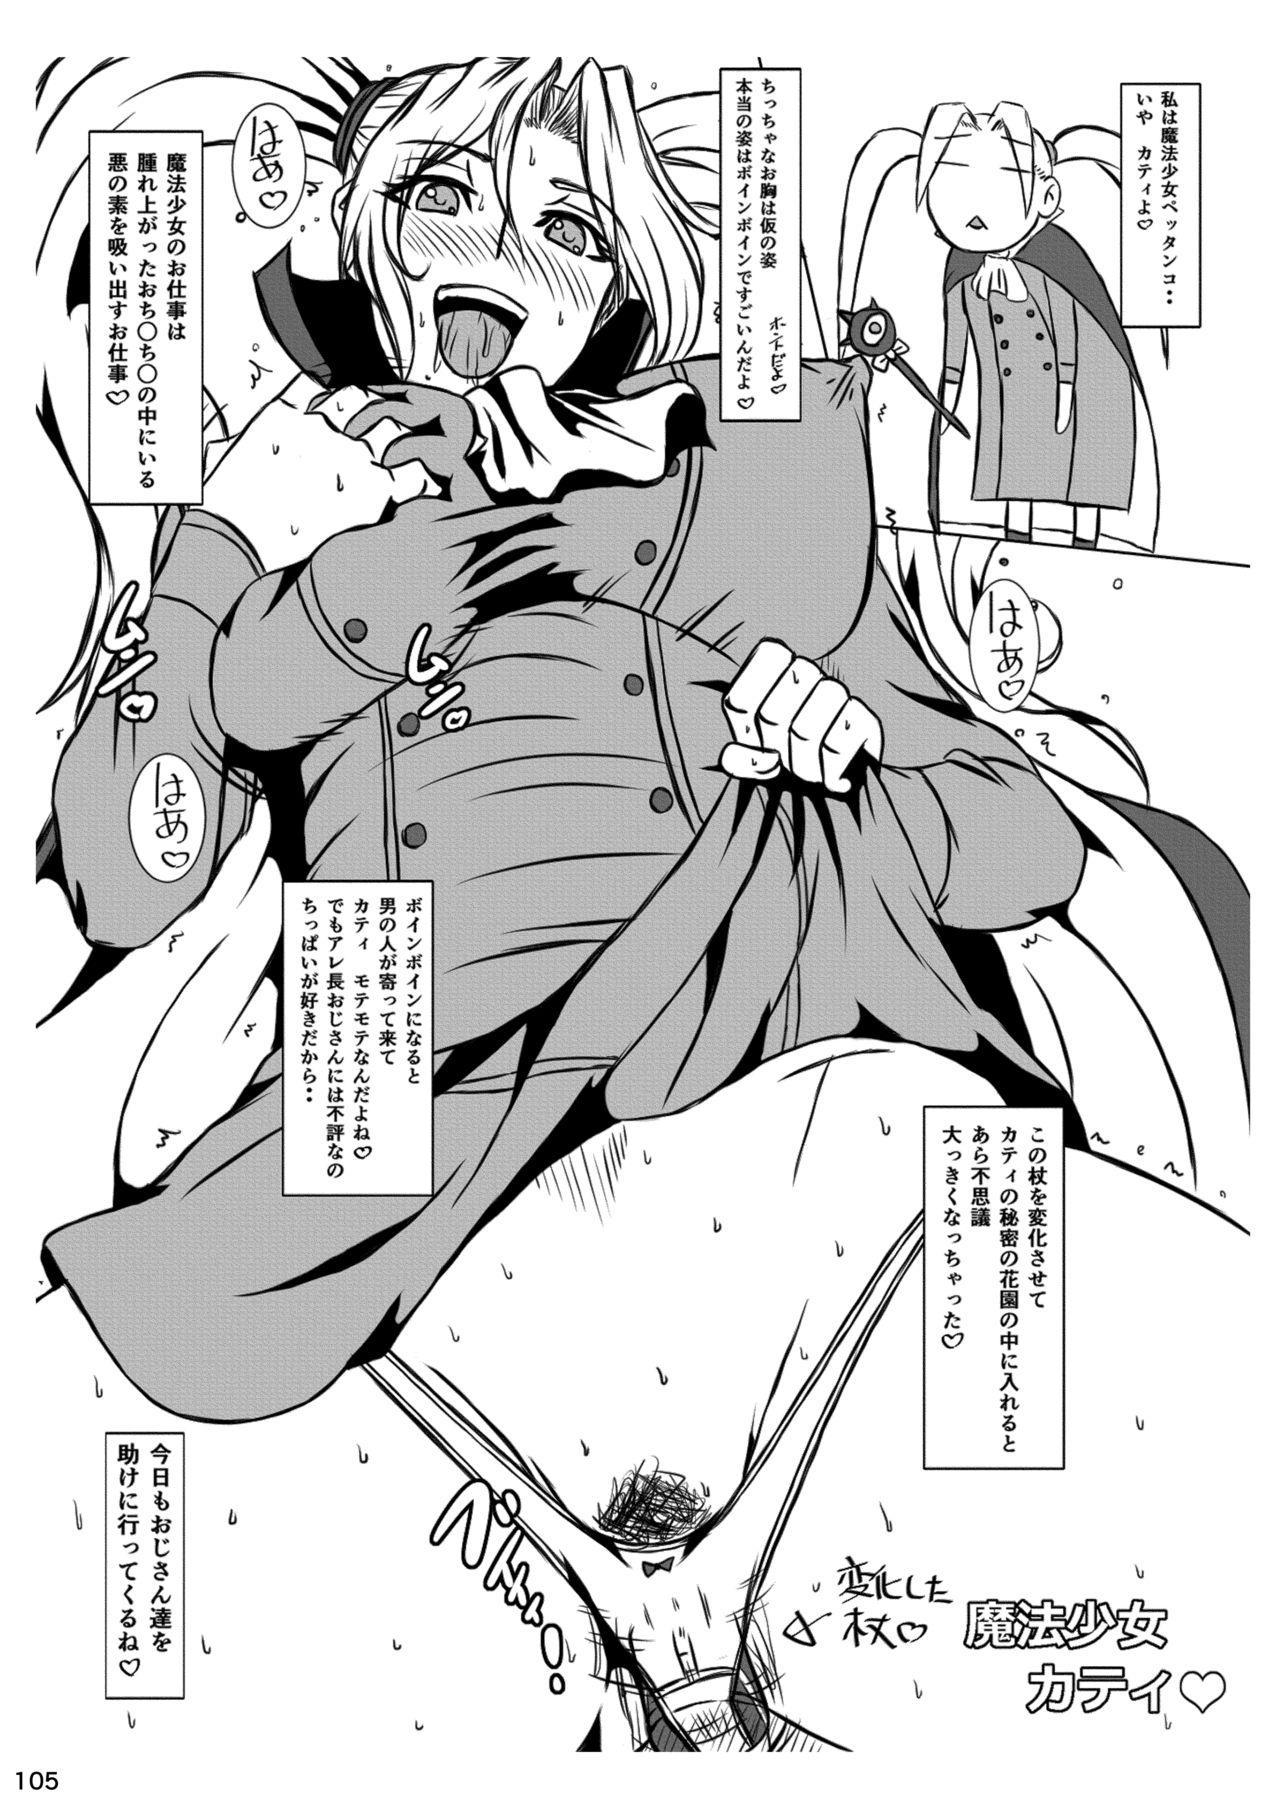 Akatsuki Blitzkampf & EN-1 Perfekt Welt Gangbang Anthology 104